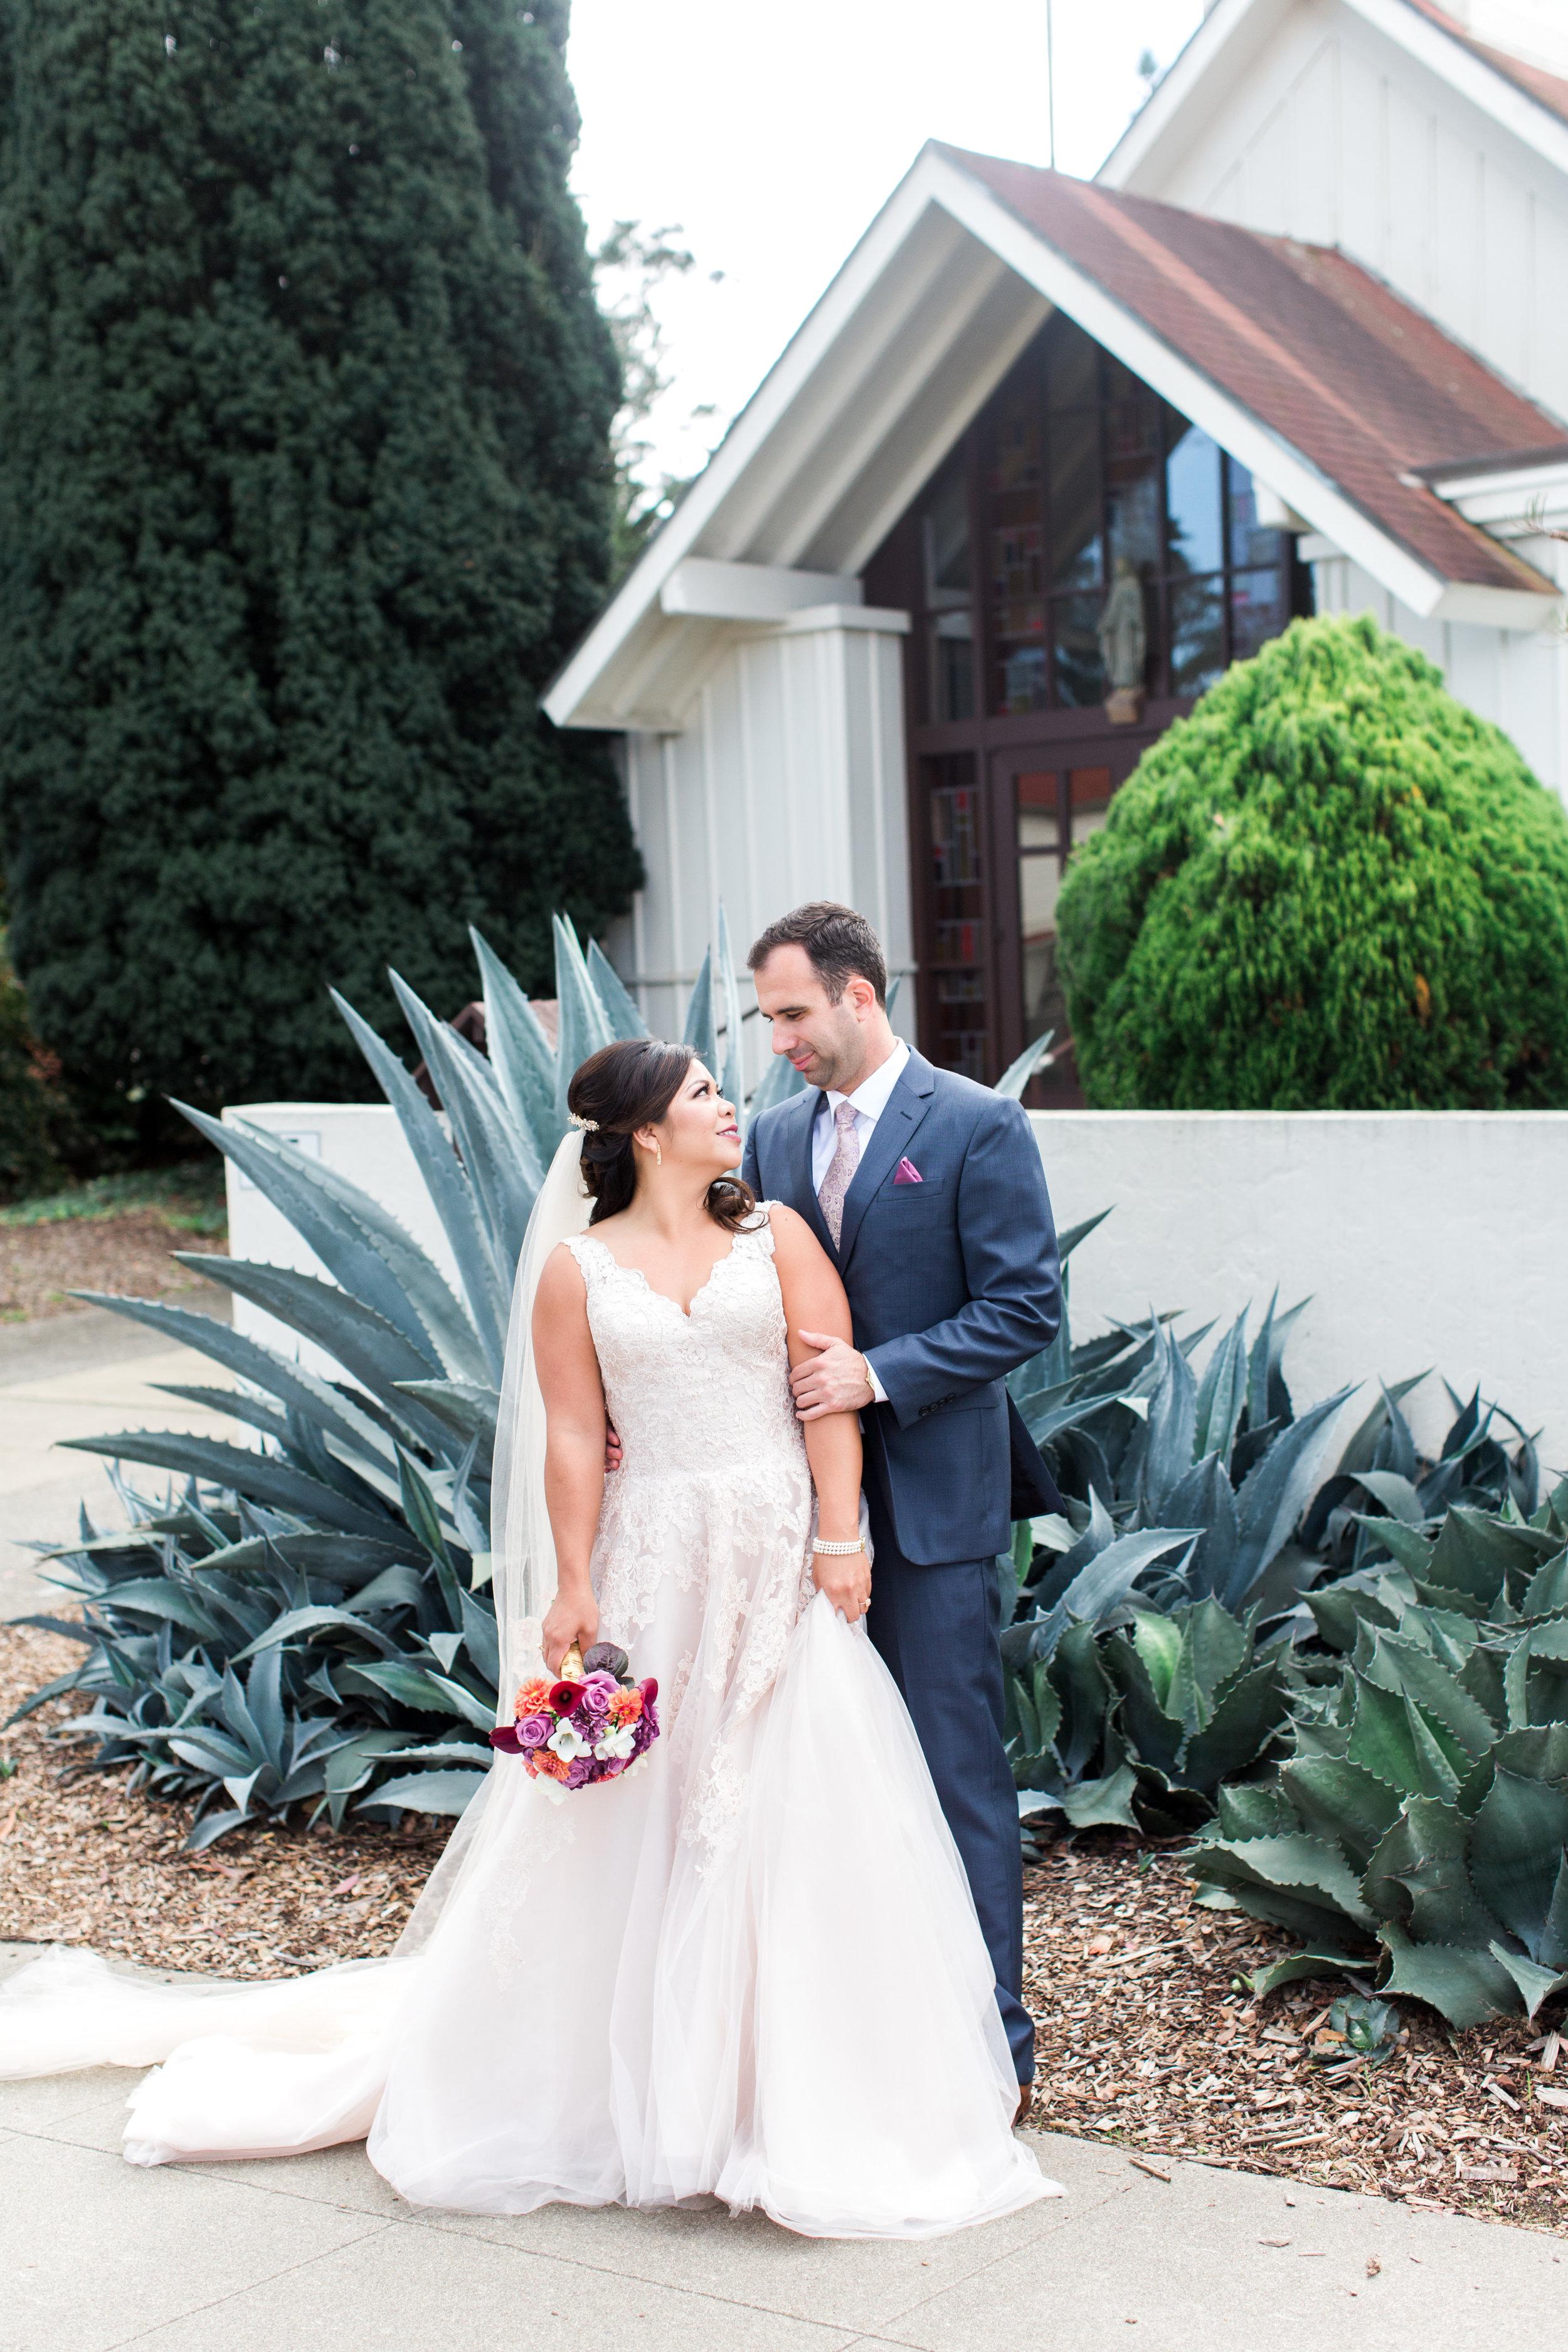 presidio-wedding-in-san-francisco.jpg